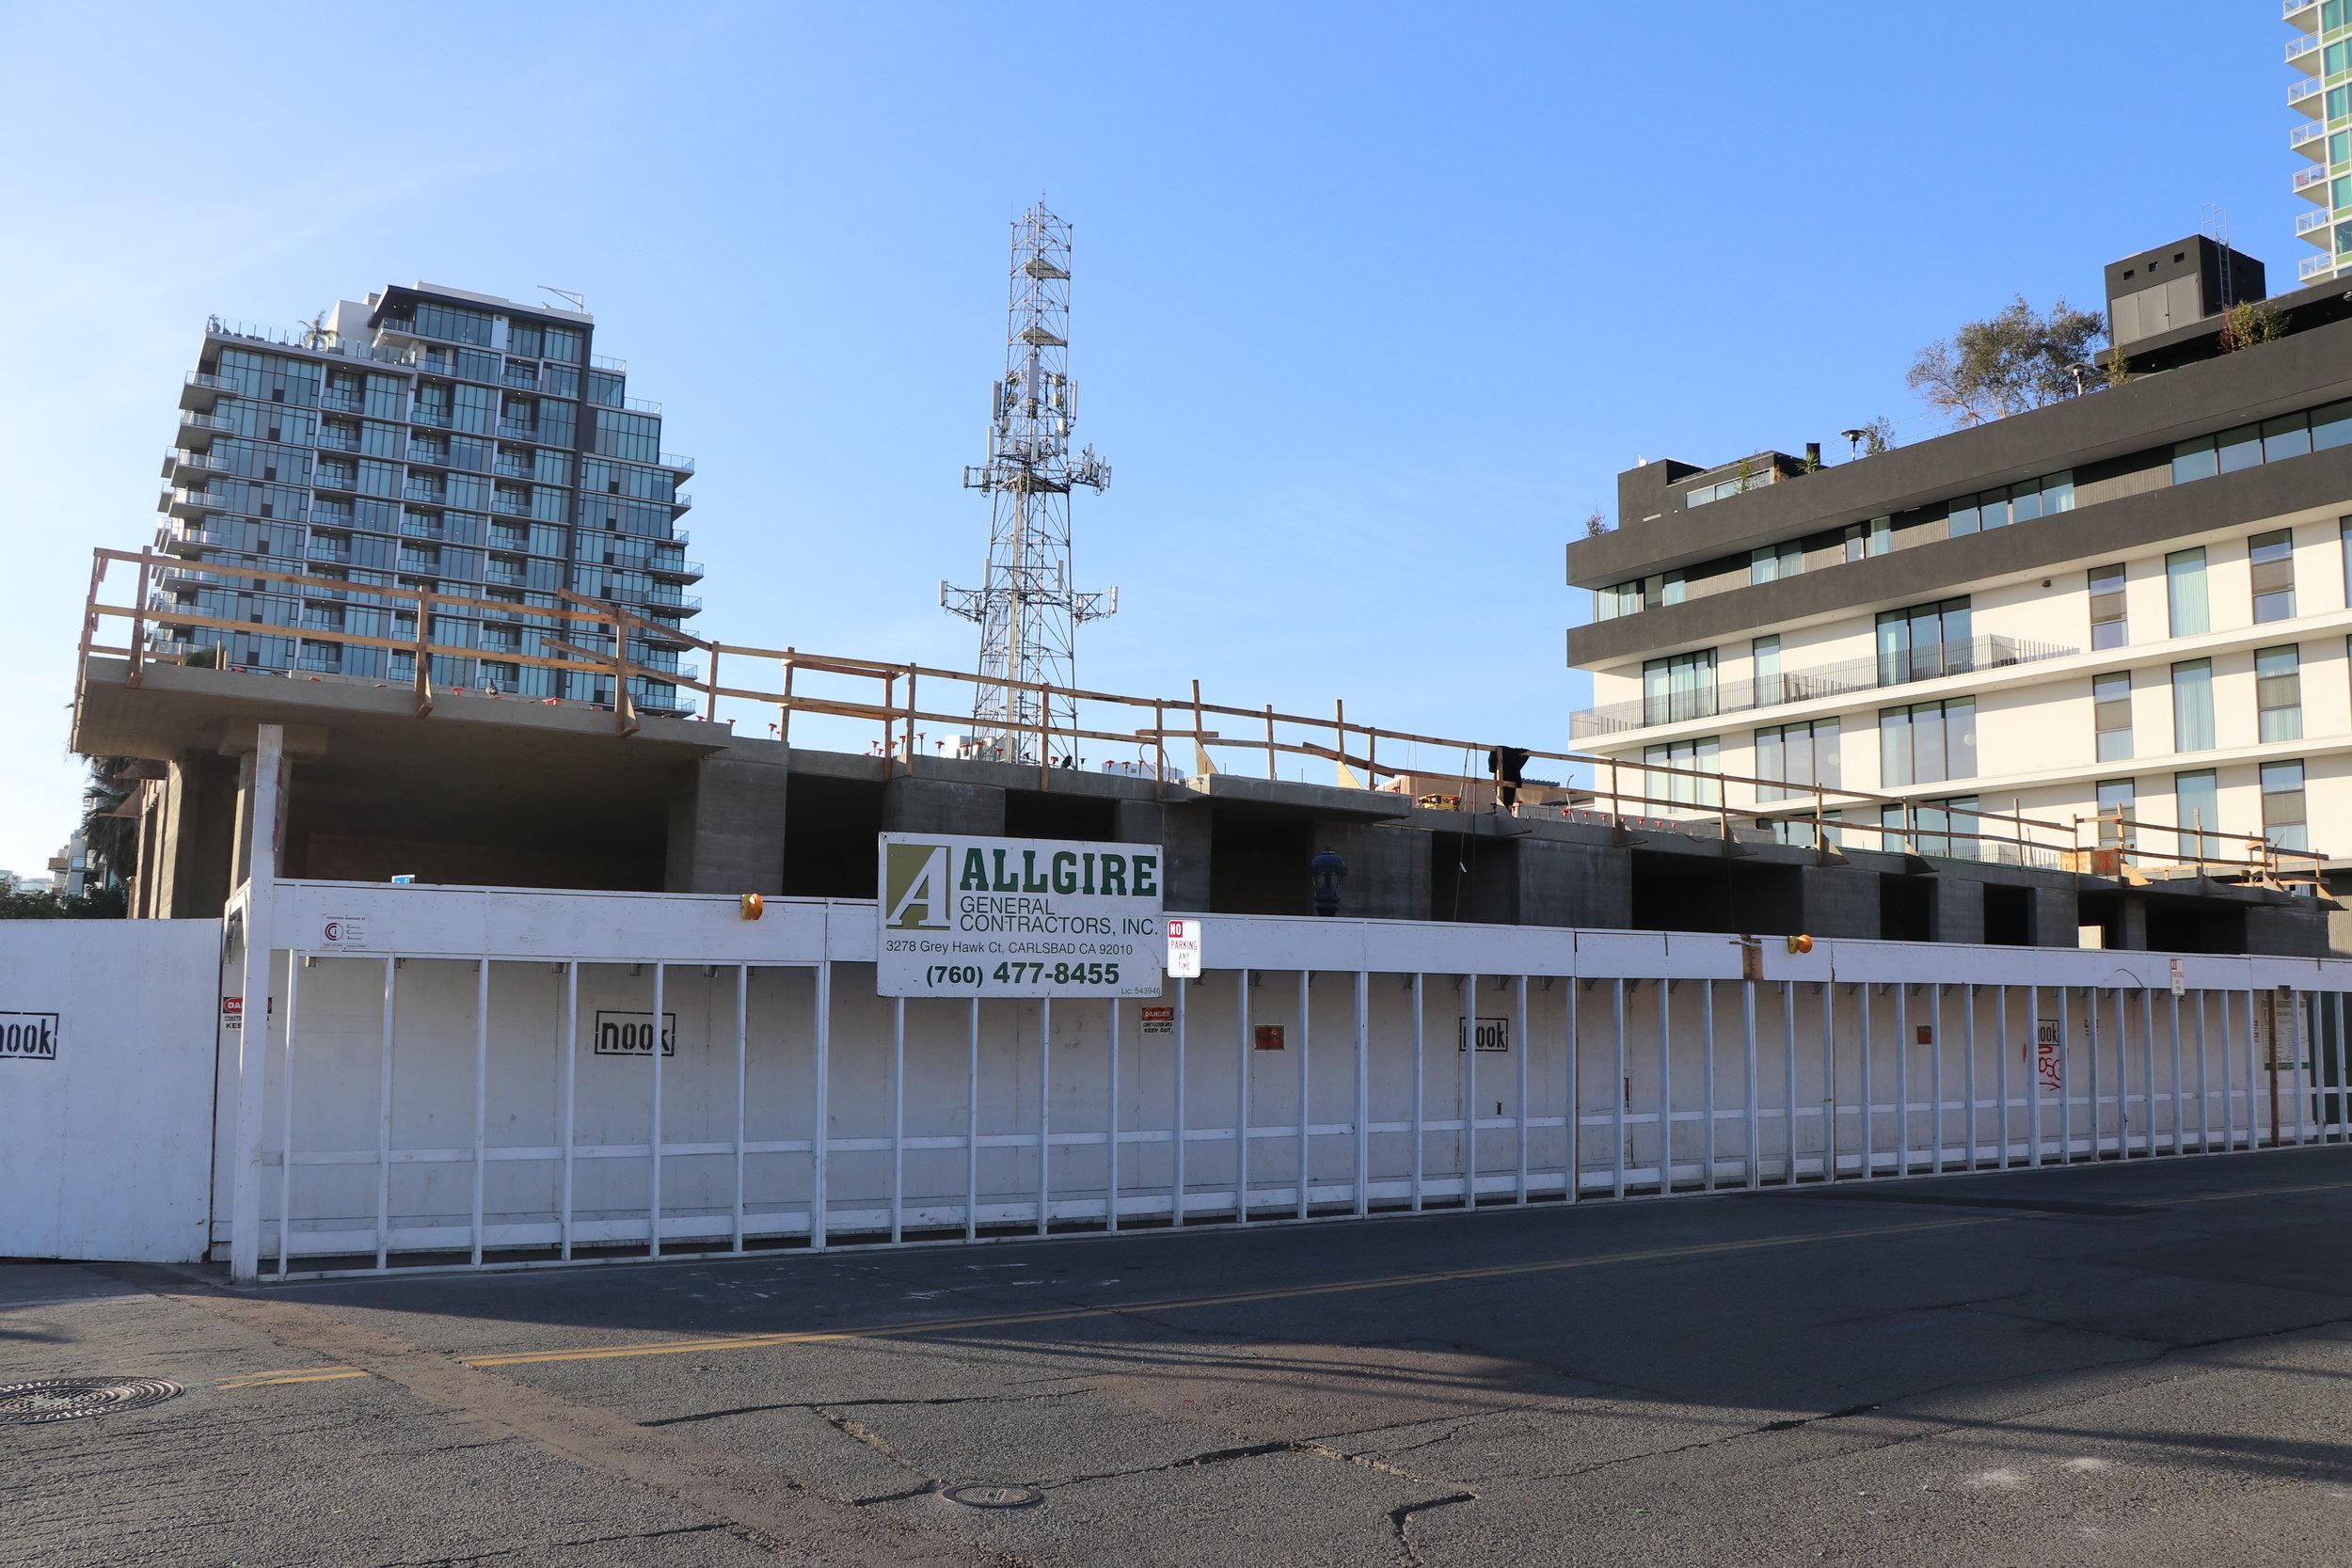 Nook East Village - San DiegoAllgire General Contractors